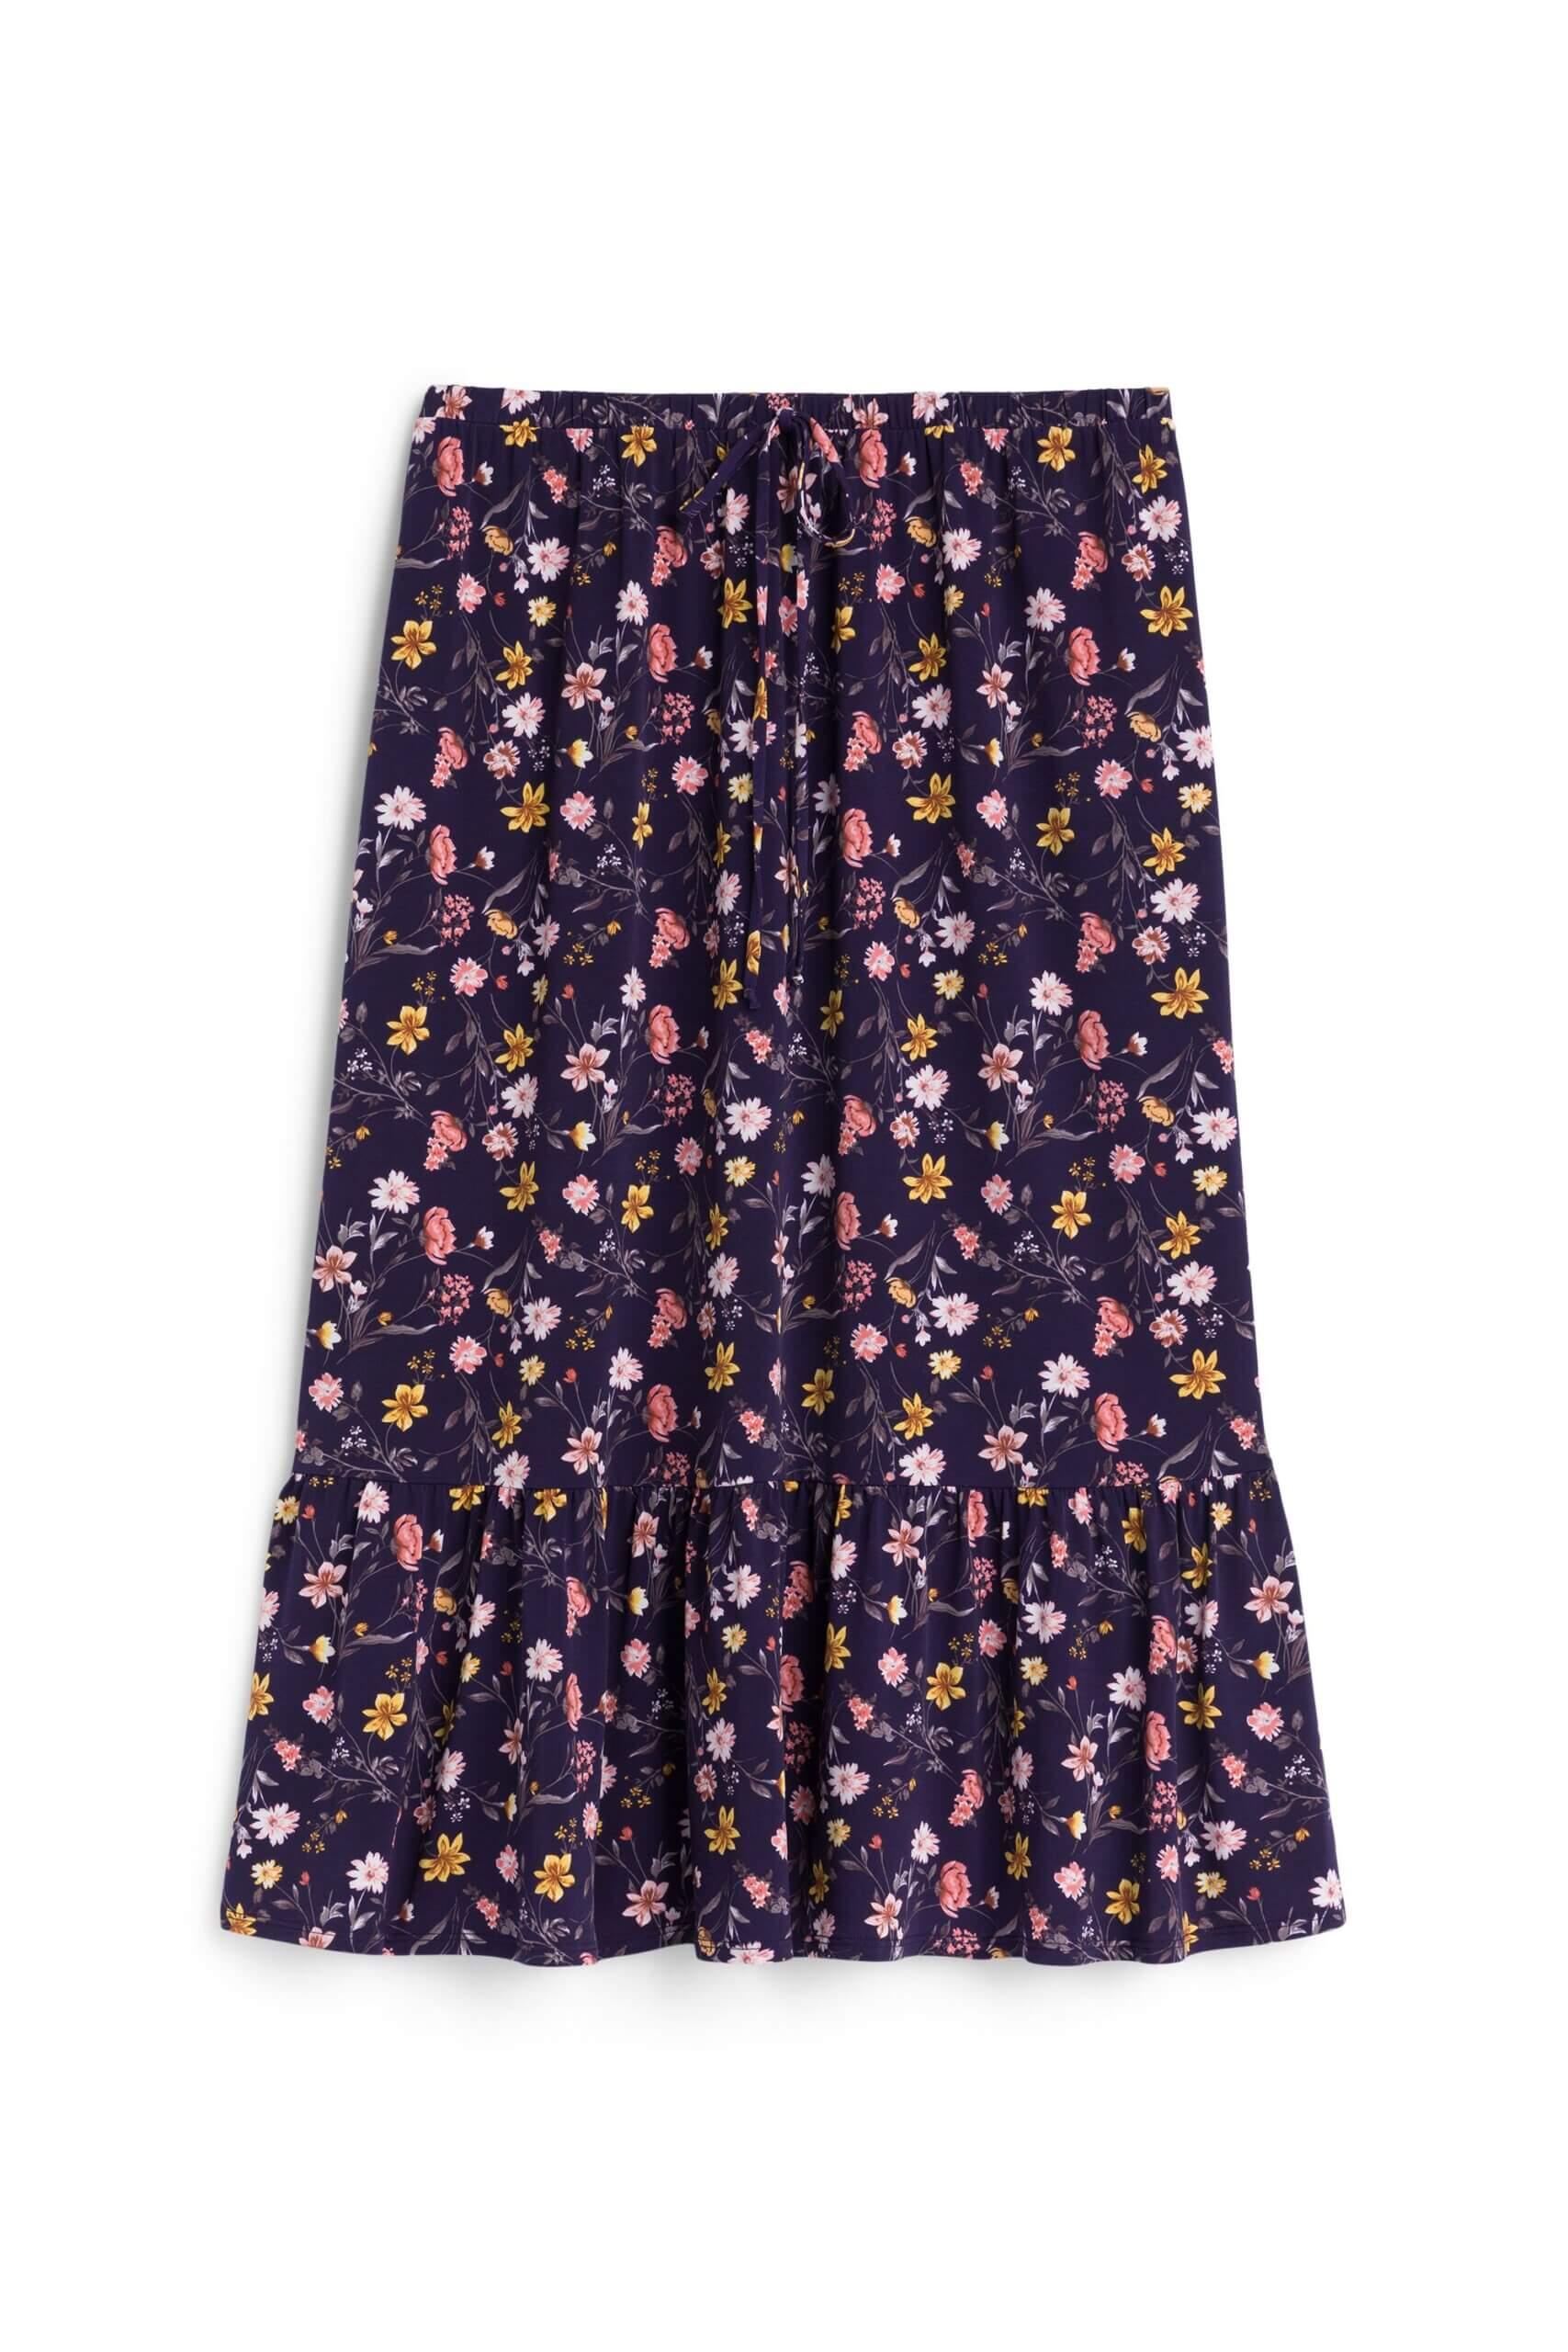 Stitch Fix women's purple boho tiered maxi skirt with dainty floral print.